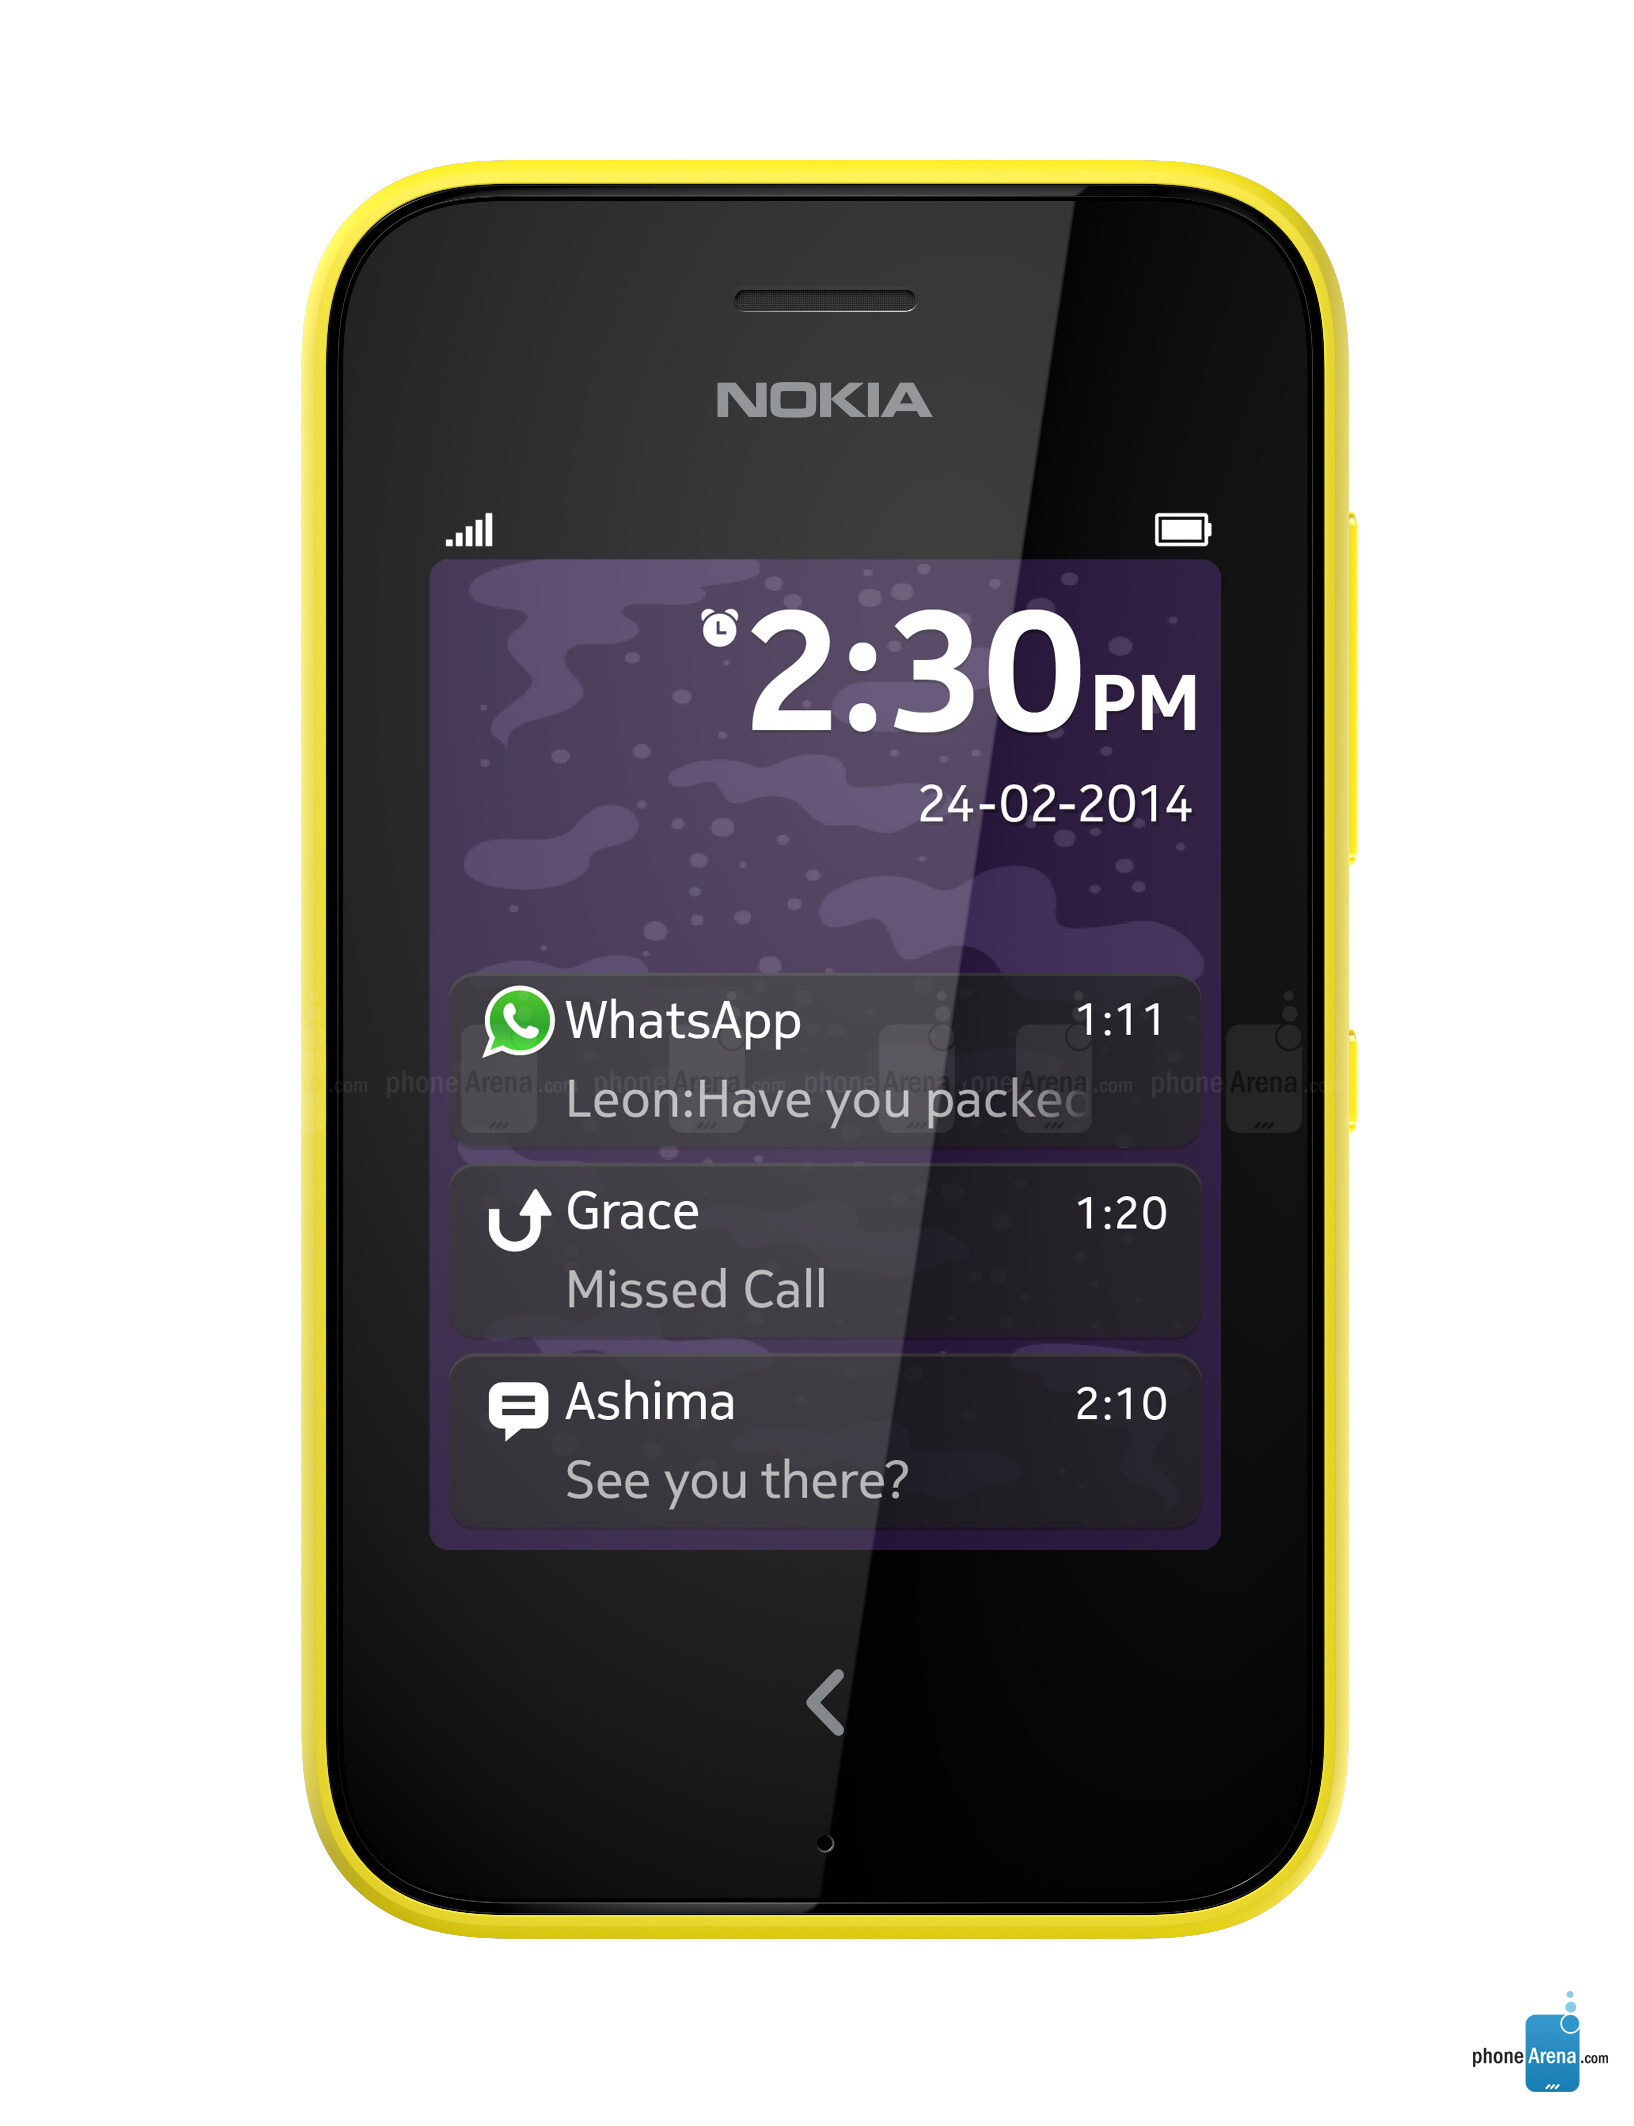 Nokia Asha 230 Specs